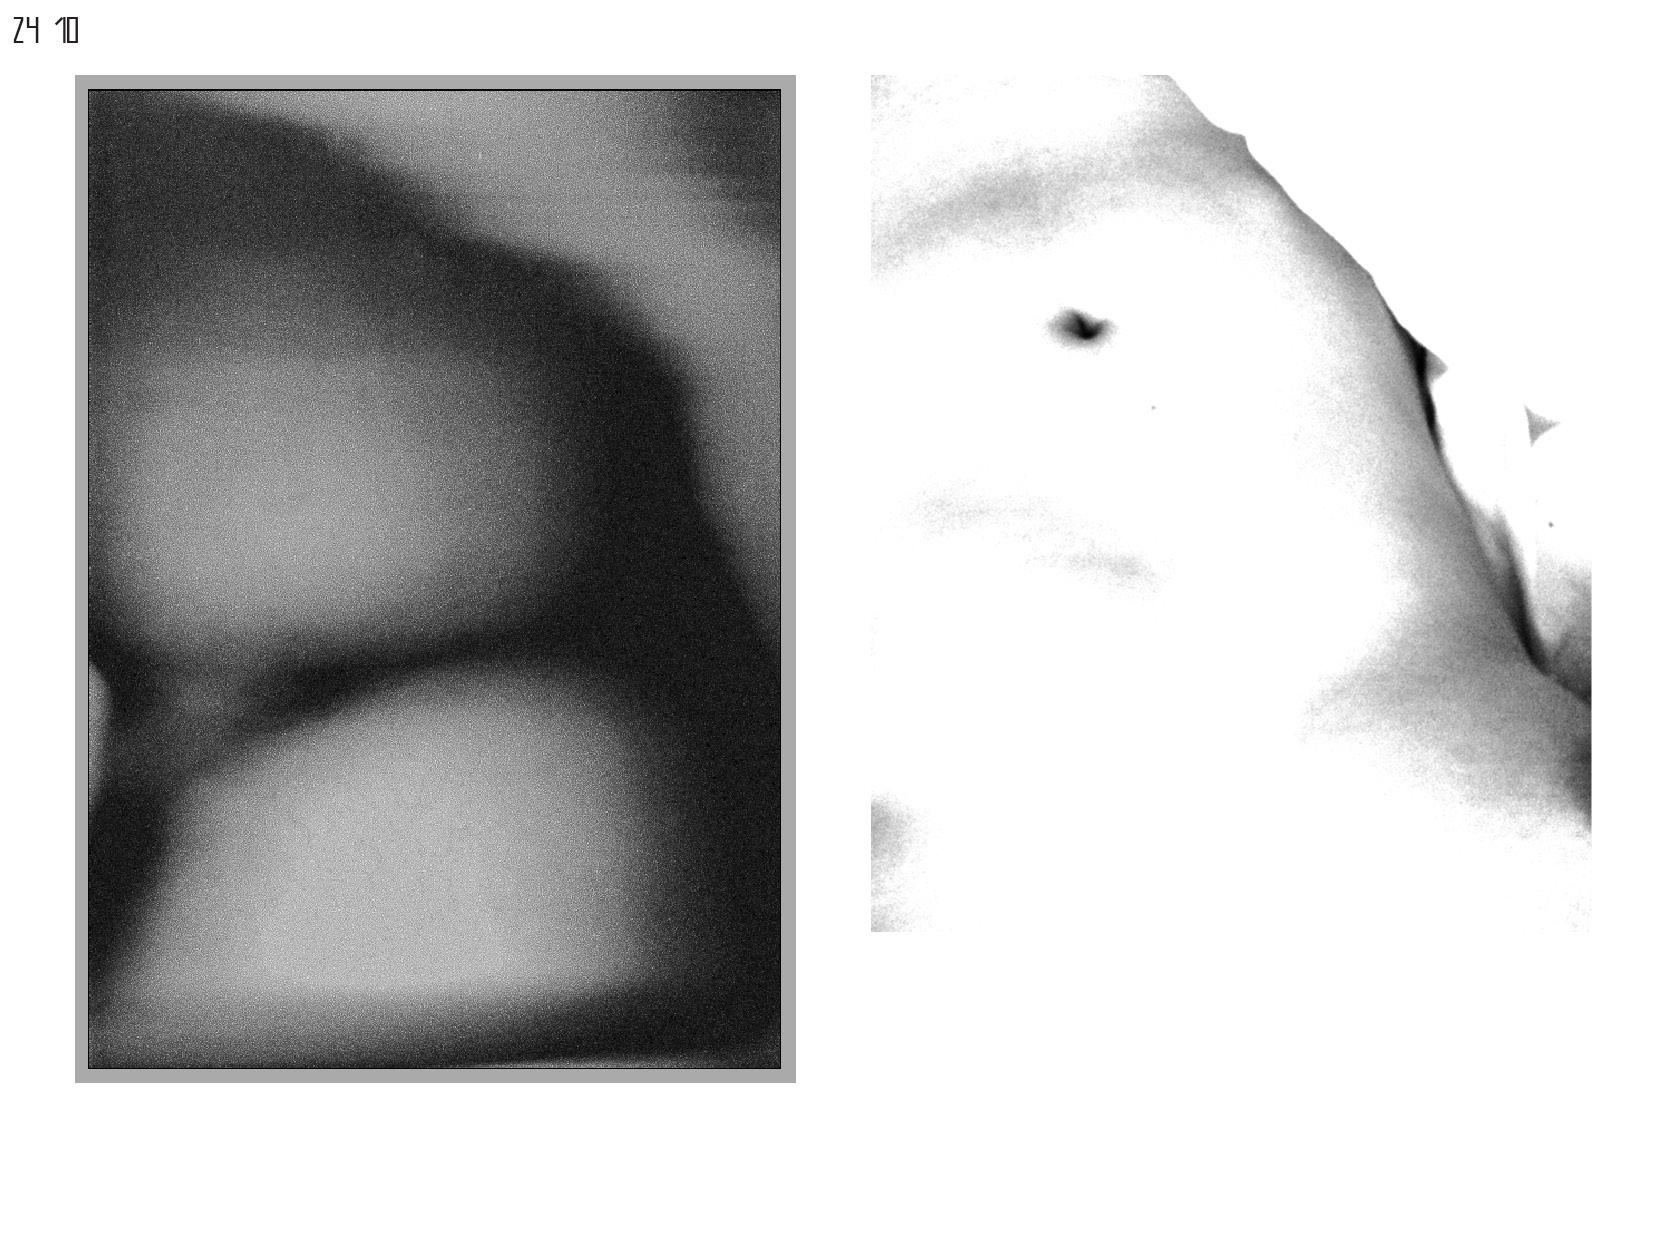 Gerrit-Schweiger-Dialog-Städte-Paris-Berlin-Jessica-Blank-Experiment-Fotoserie-Tagebuch-visuelle-Kommunikation-9